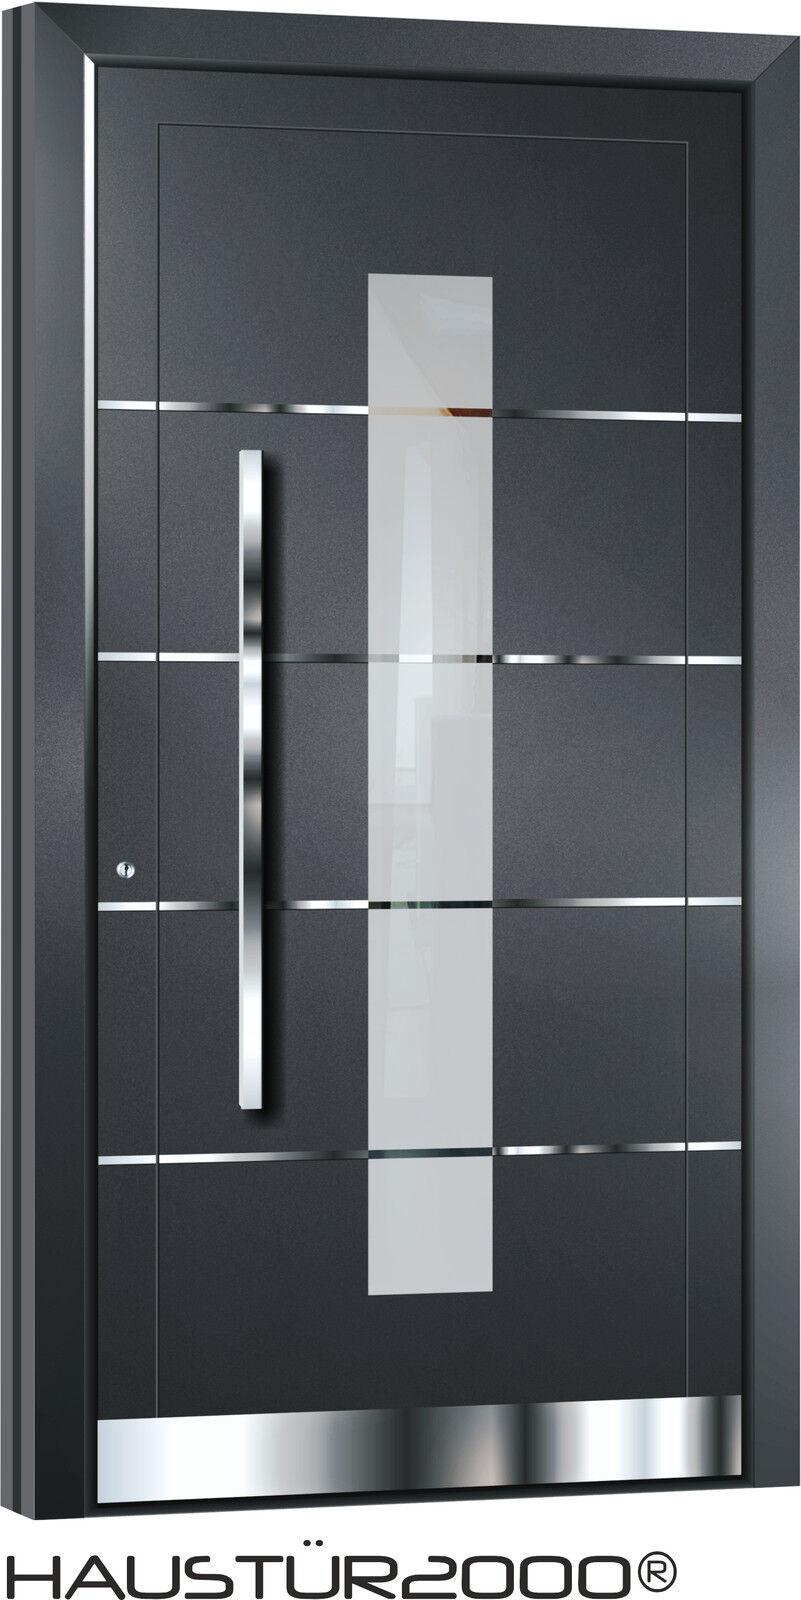 aluminium haust r alu haust ren t r t ren vollst ndig i deutschland gefertigt ebay. Black Bedroom Furniture Sets. Home Design Ideas